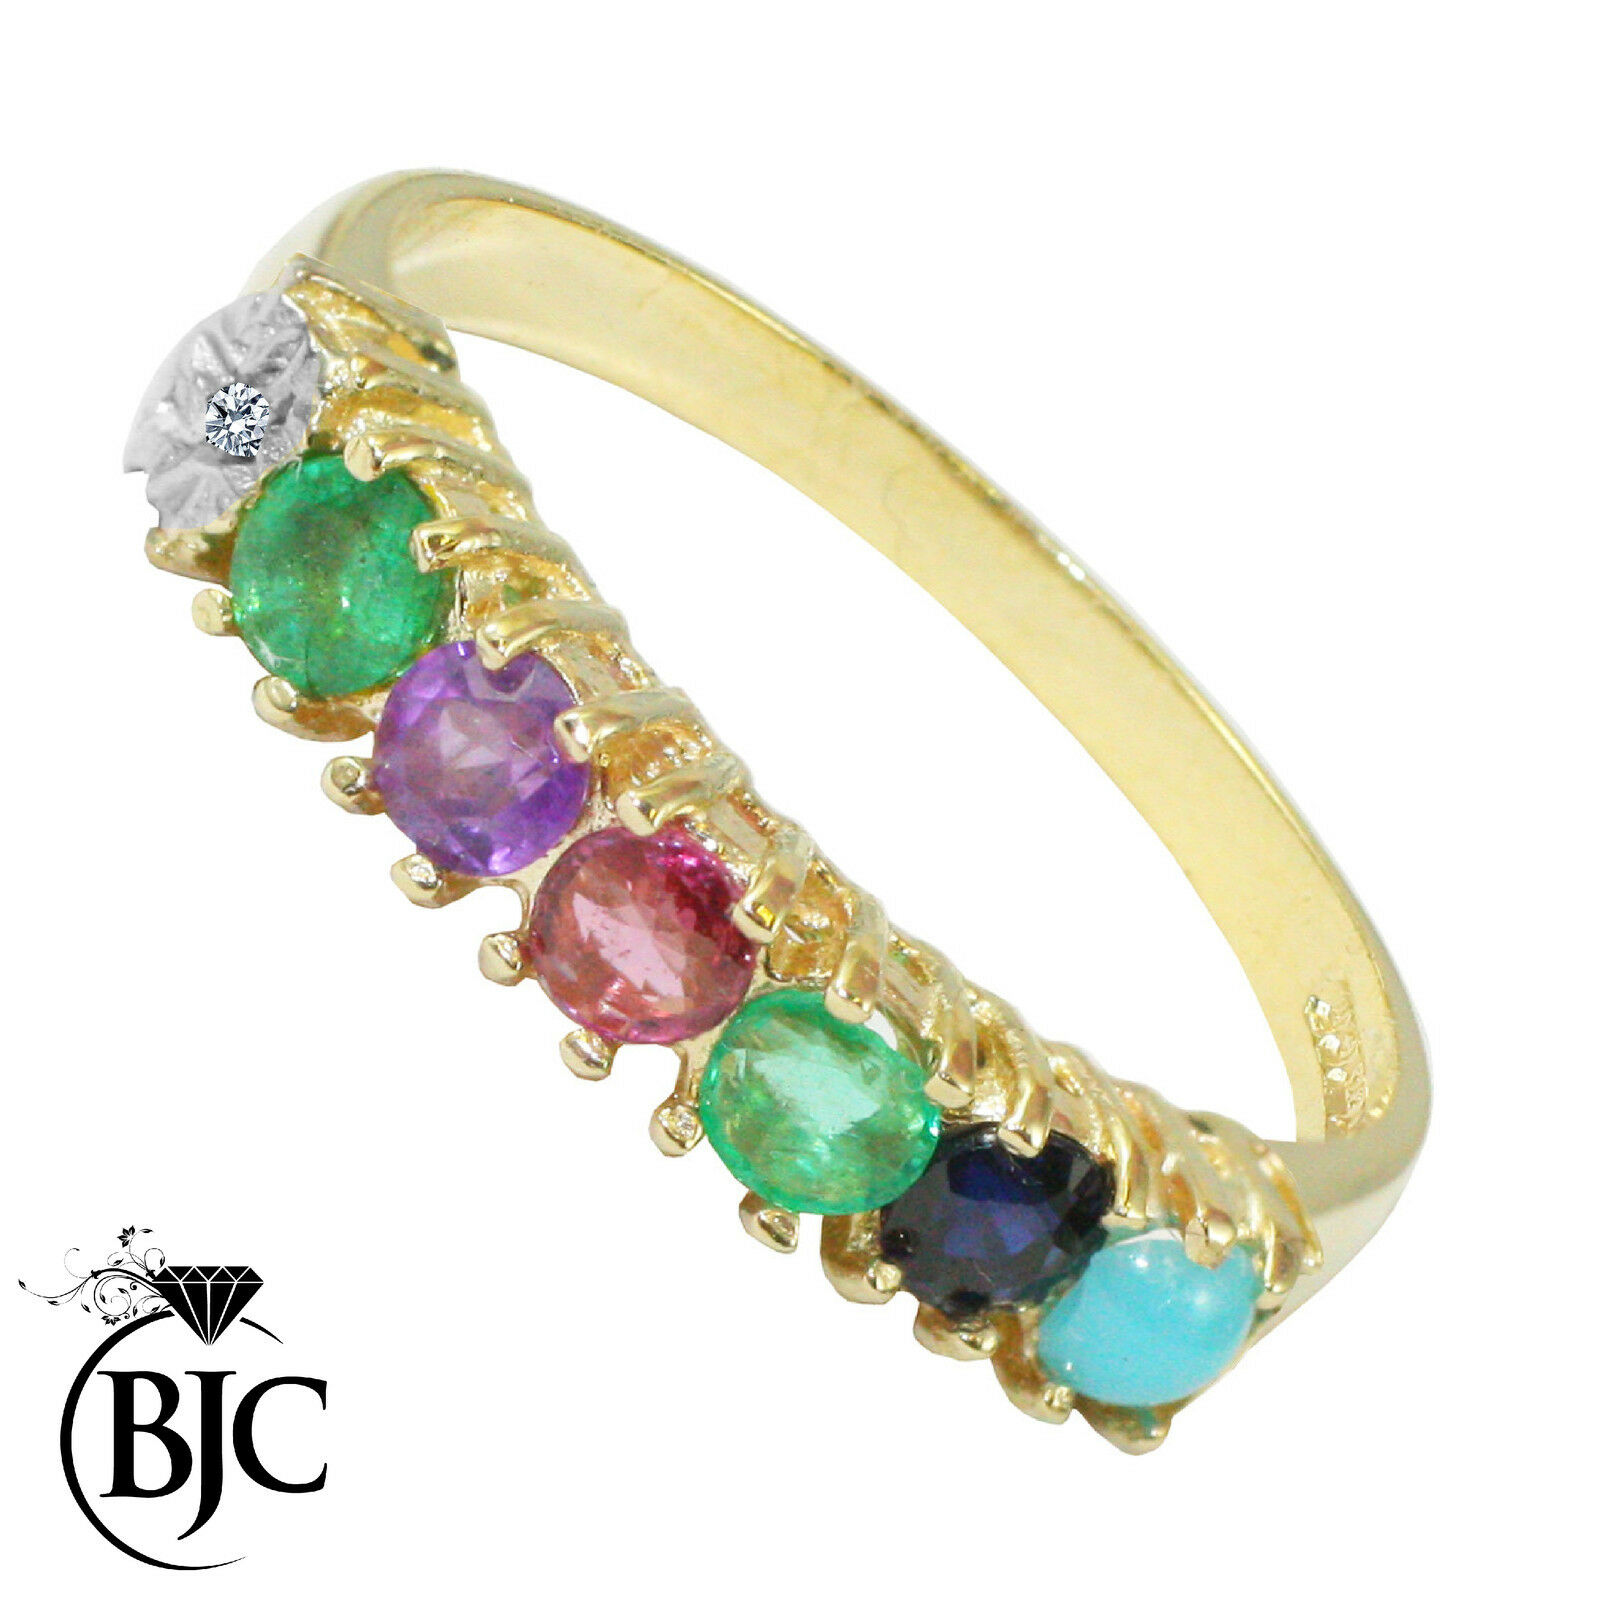 Bjc 9 Karat yellowgold Liebste Ring Diamant Smaragd Amethyst Rubin Saphir